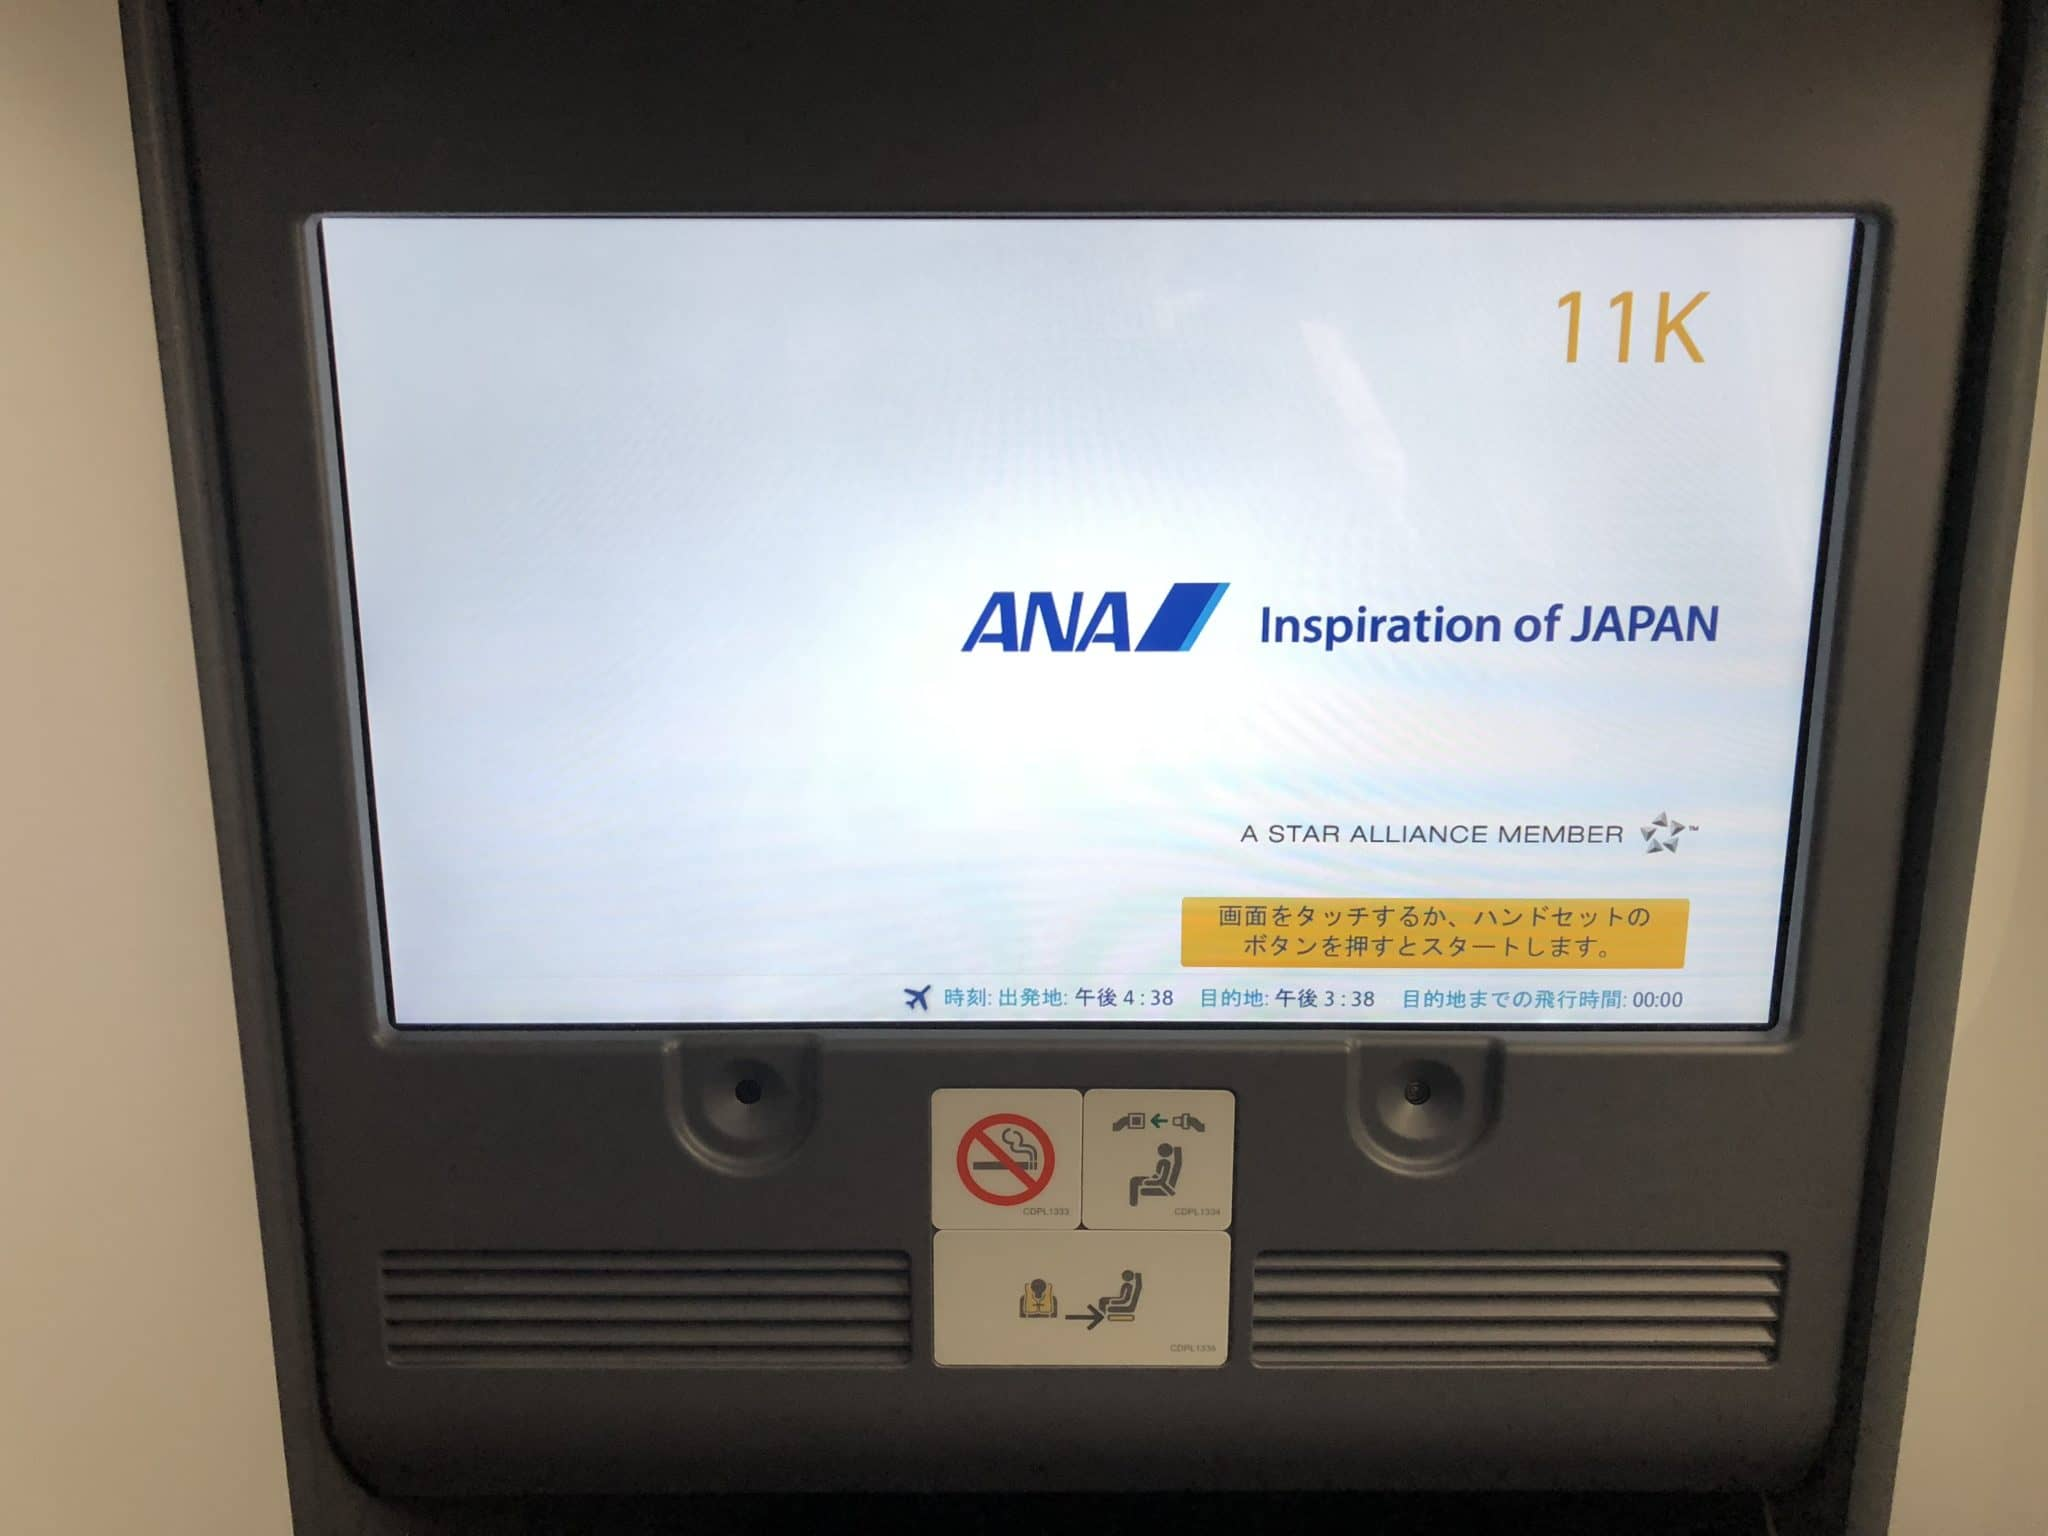 ANA Business Class B787-9 Monitor